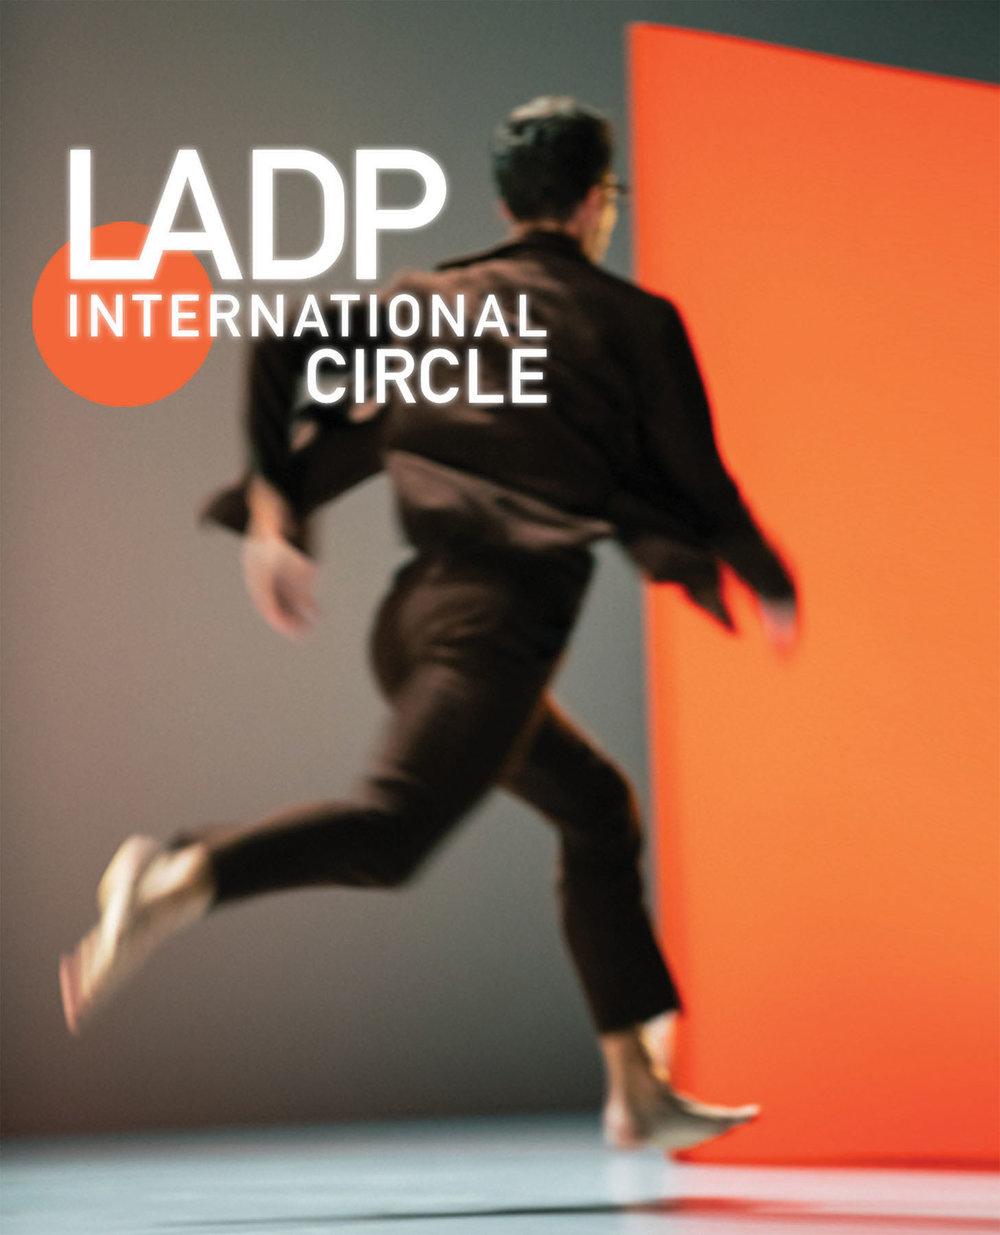 LADP_IntCir_Invite_cover.jpg